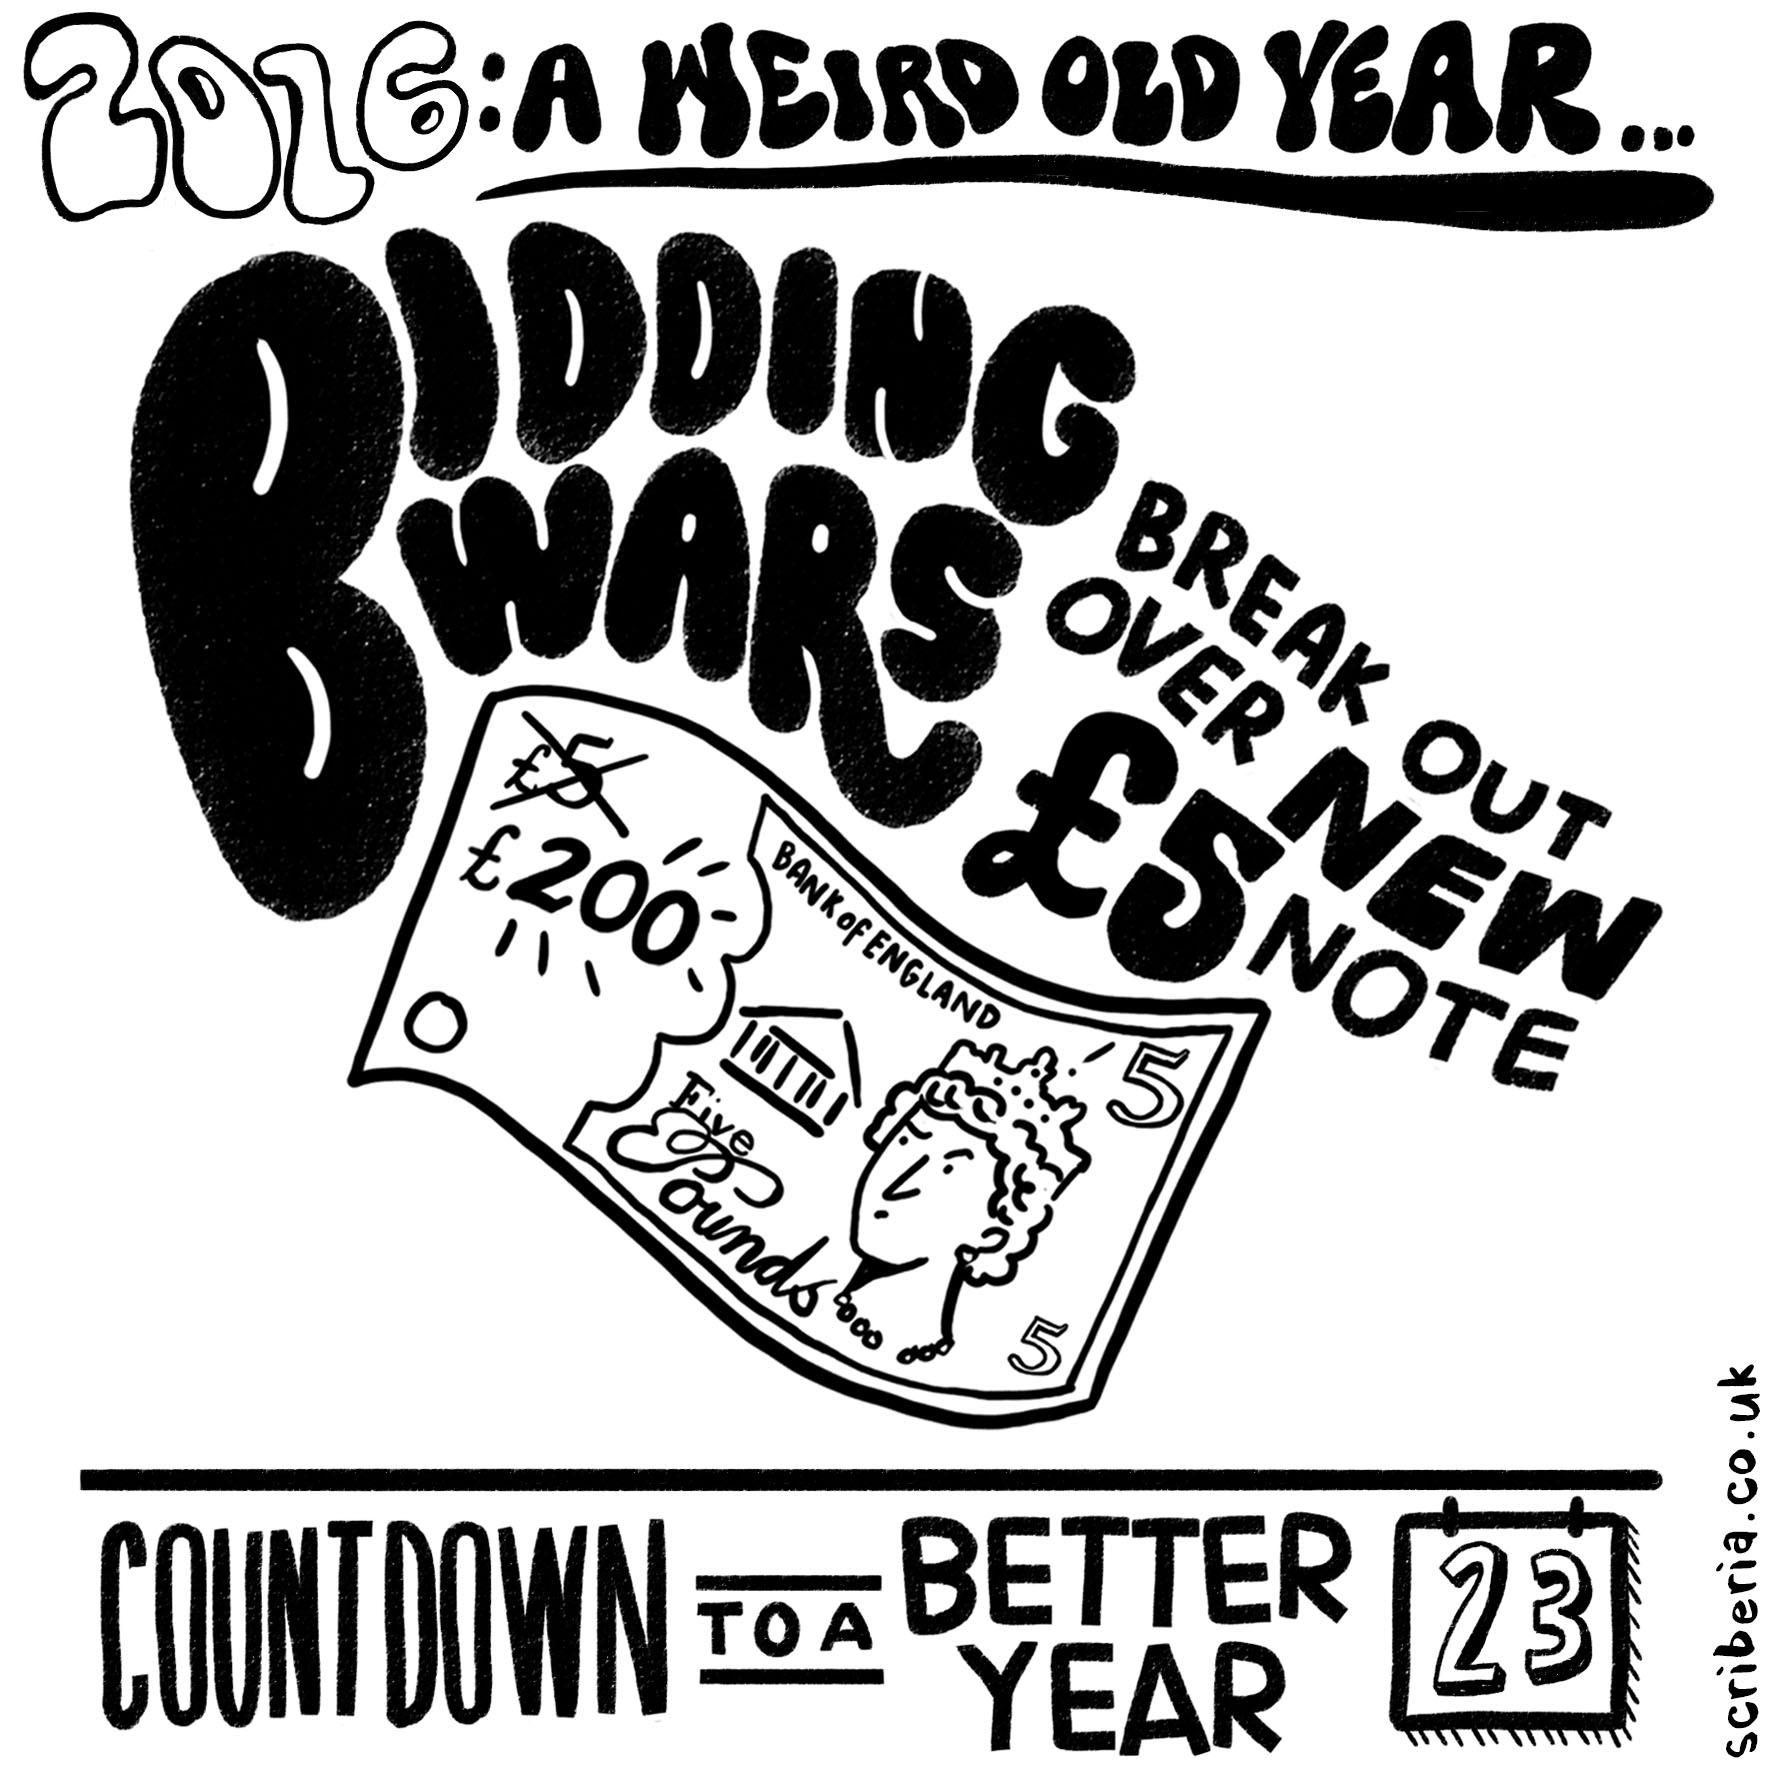 9th Scriberia 23_days to go_BIDDINGWARS.jpg